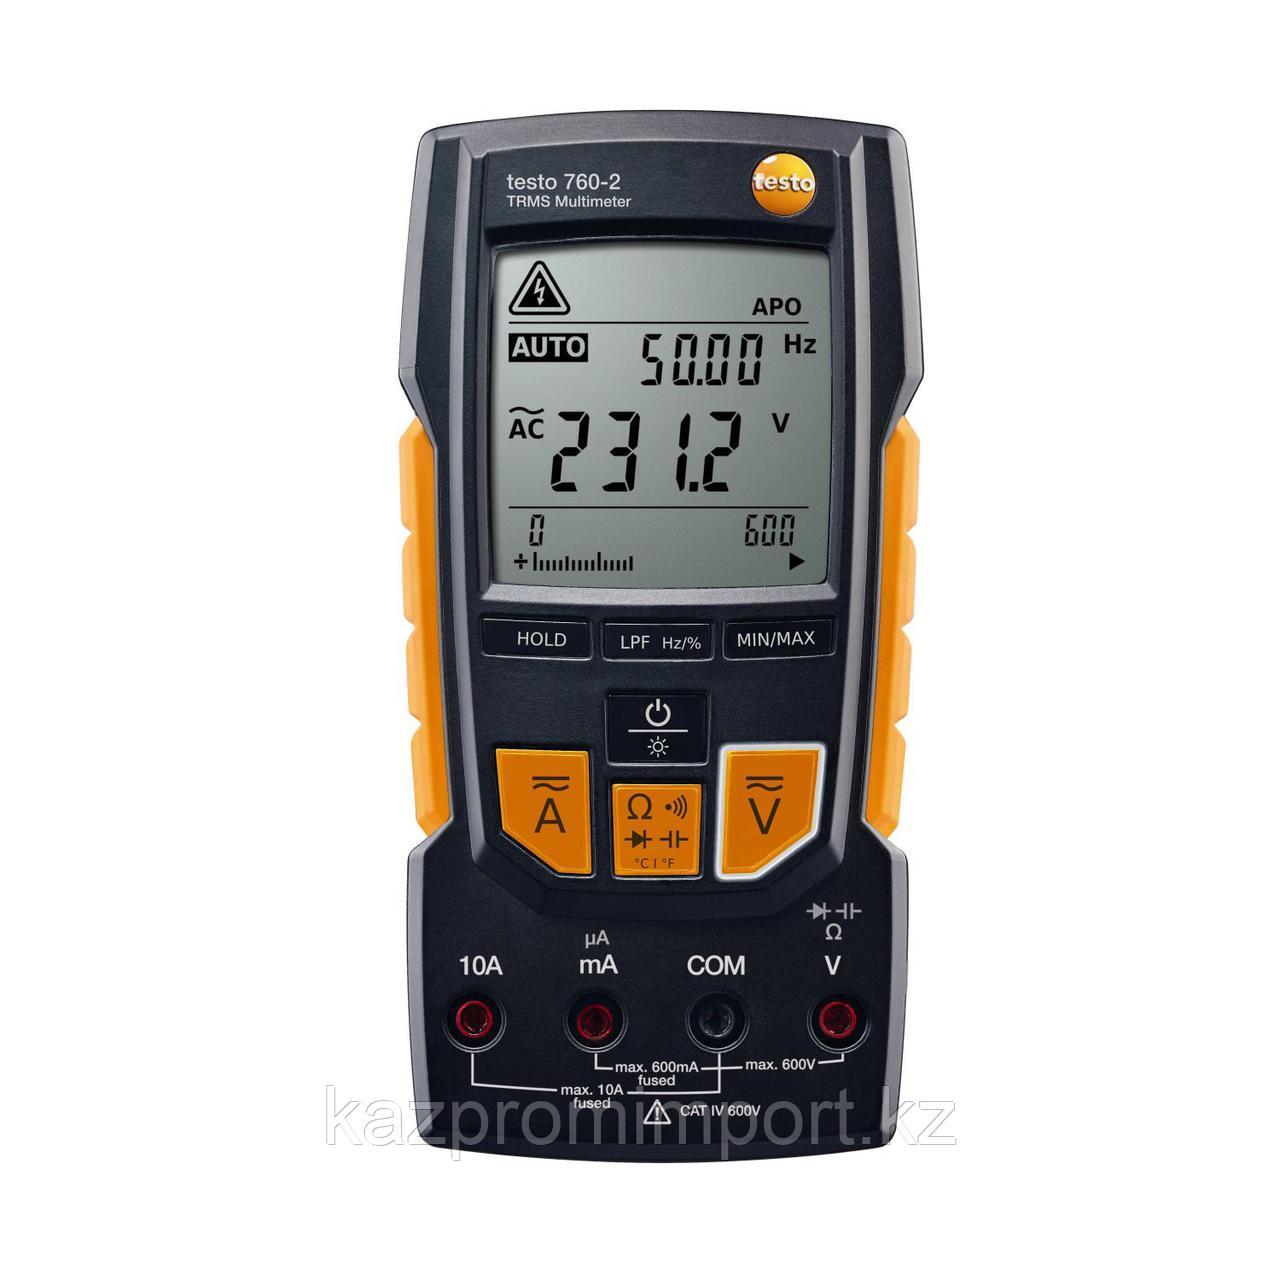 Testo 760-1 - Цифровой мультиметр